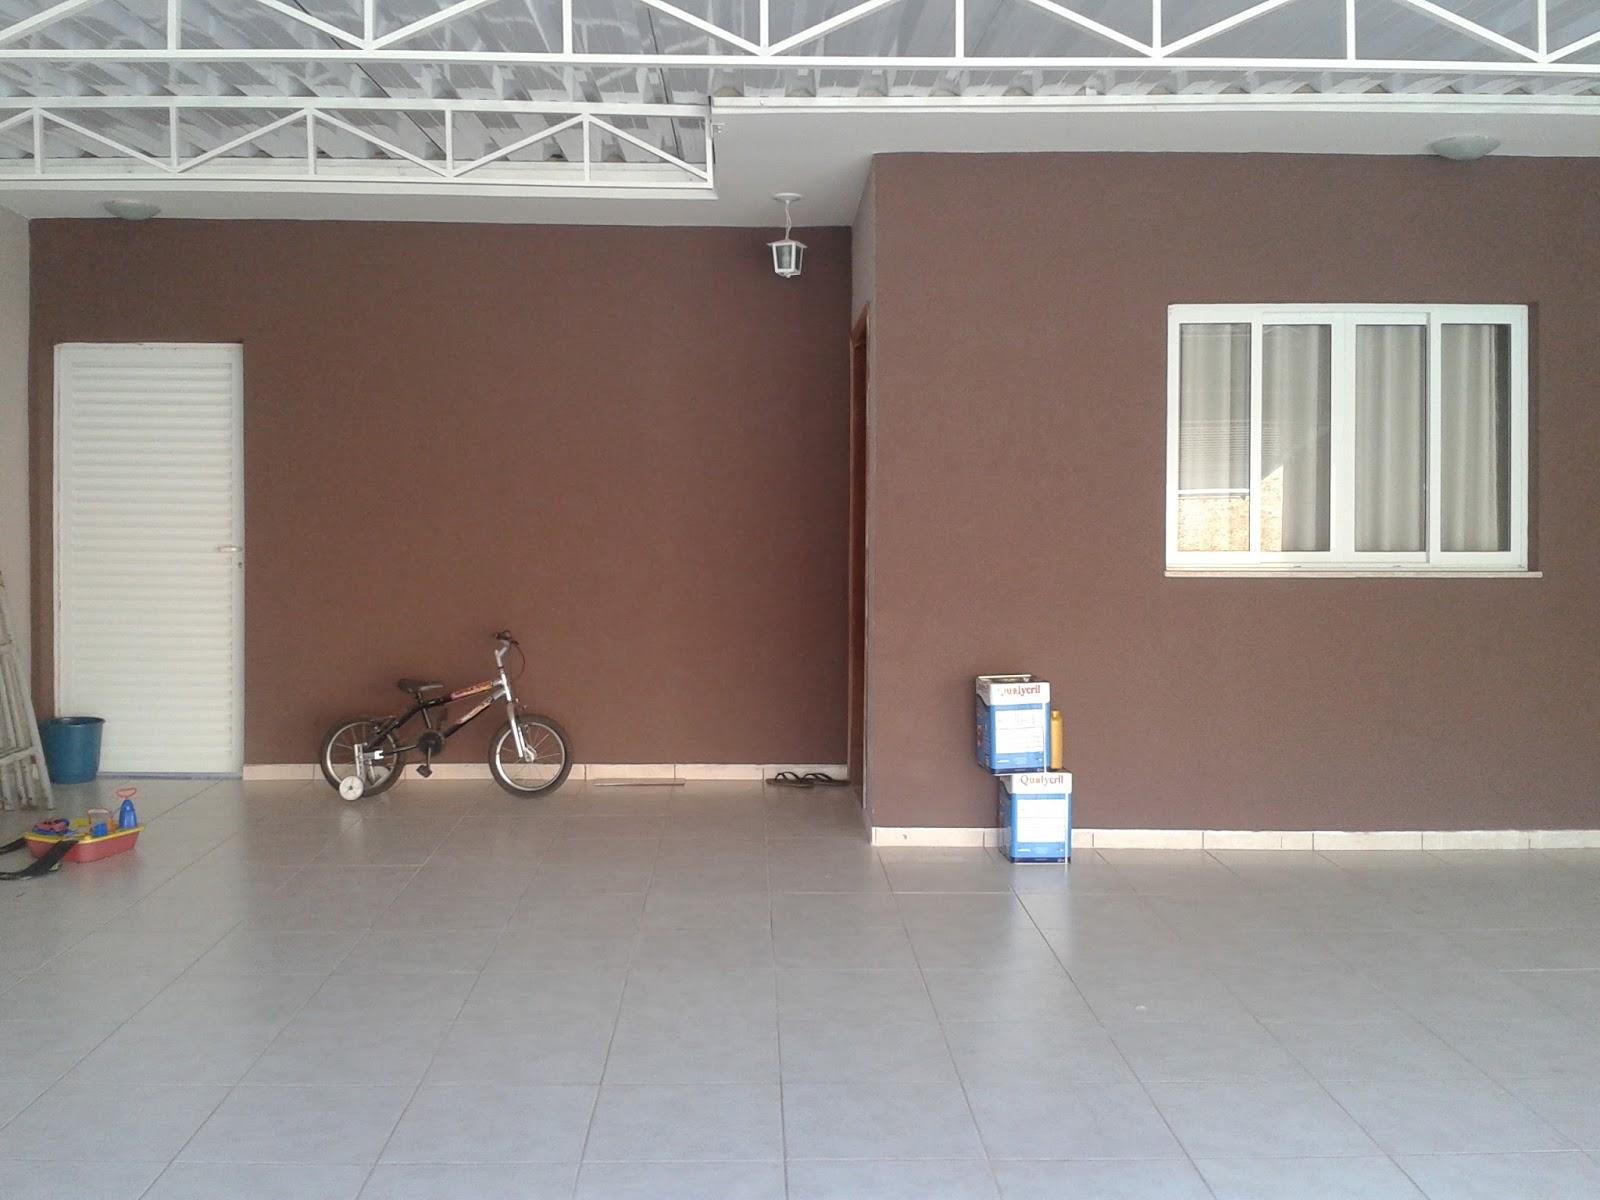 Fotos De Pinturas De Casas Simples Decorando Casas -> Pinturas De Sala Pequena